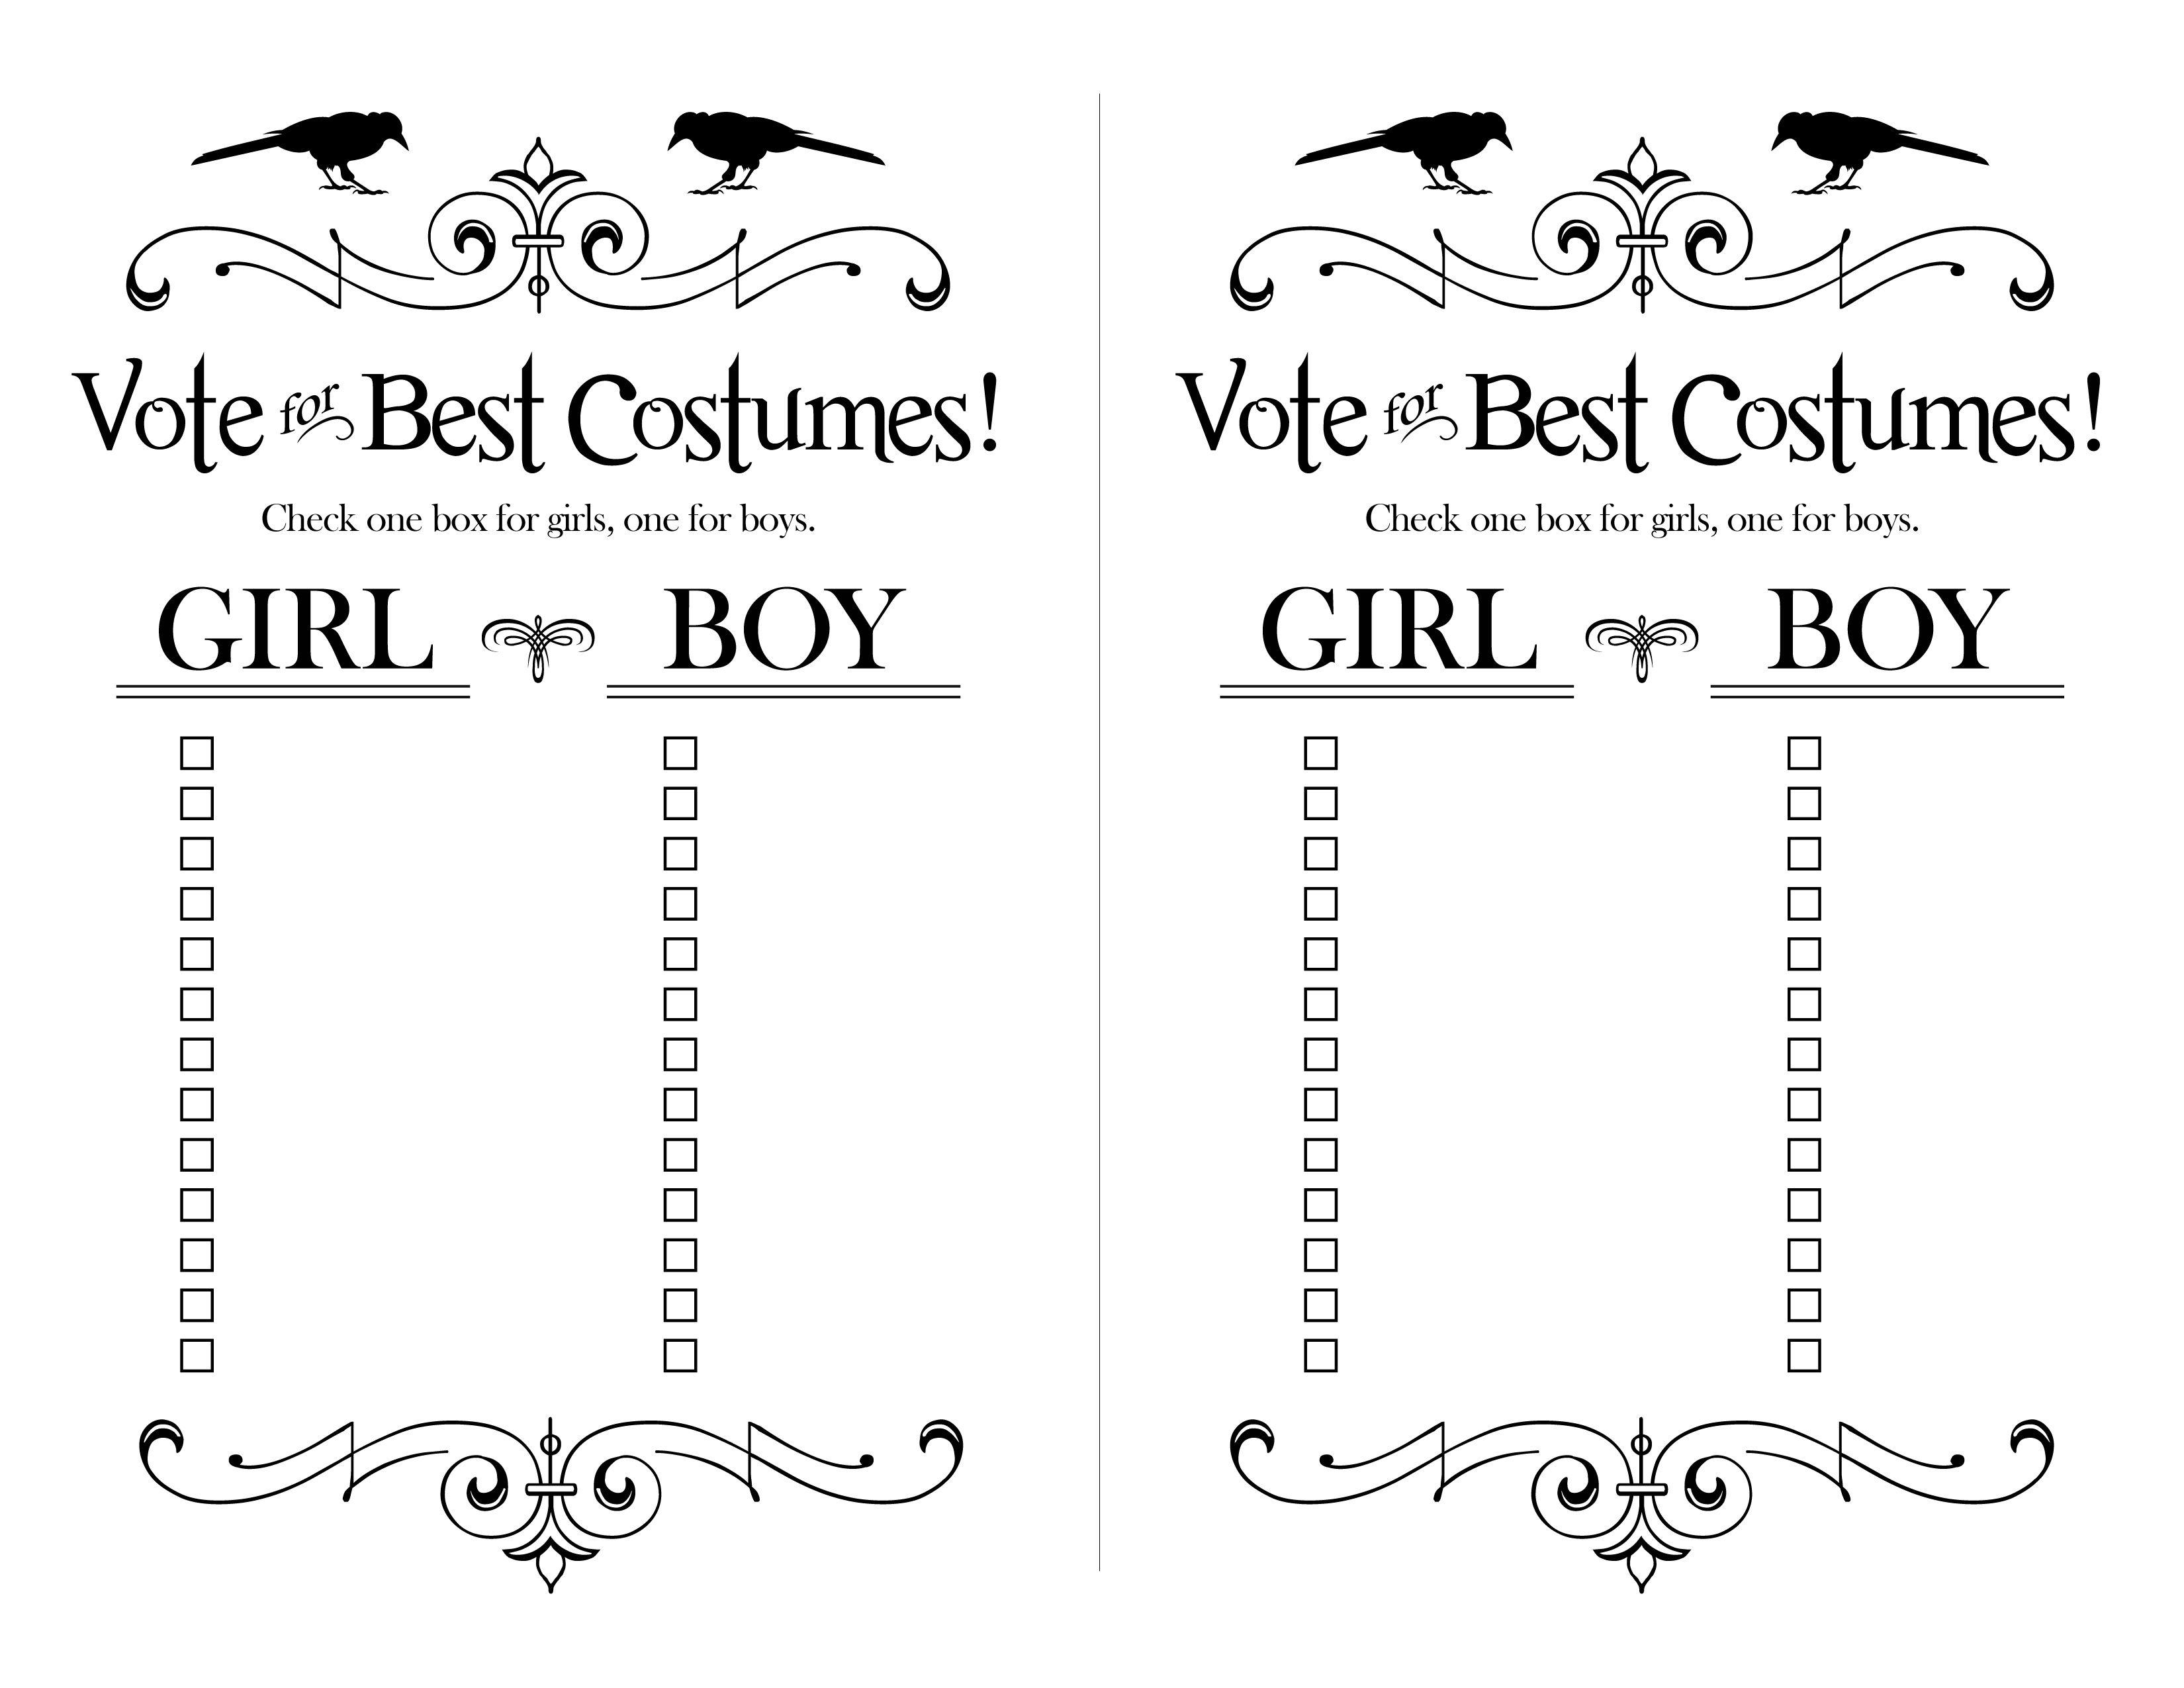 Classroom Best Costume Ballots For Halloween